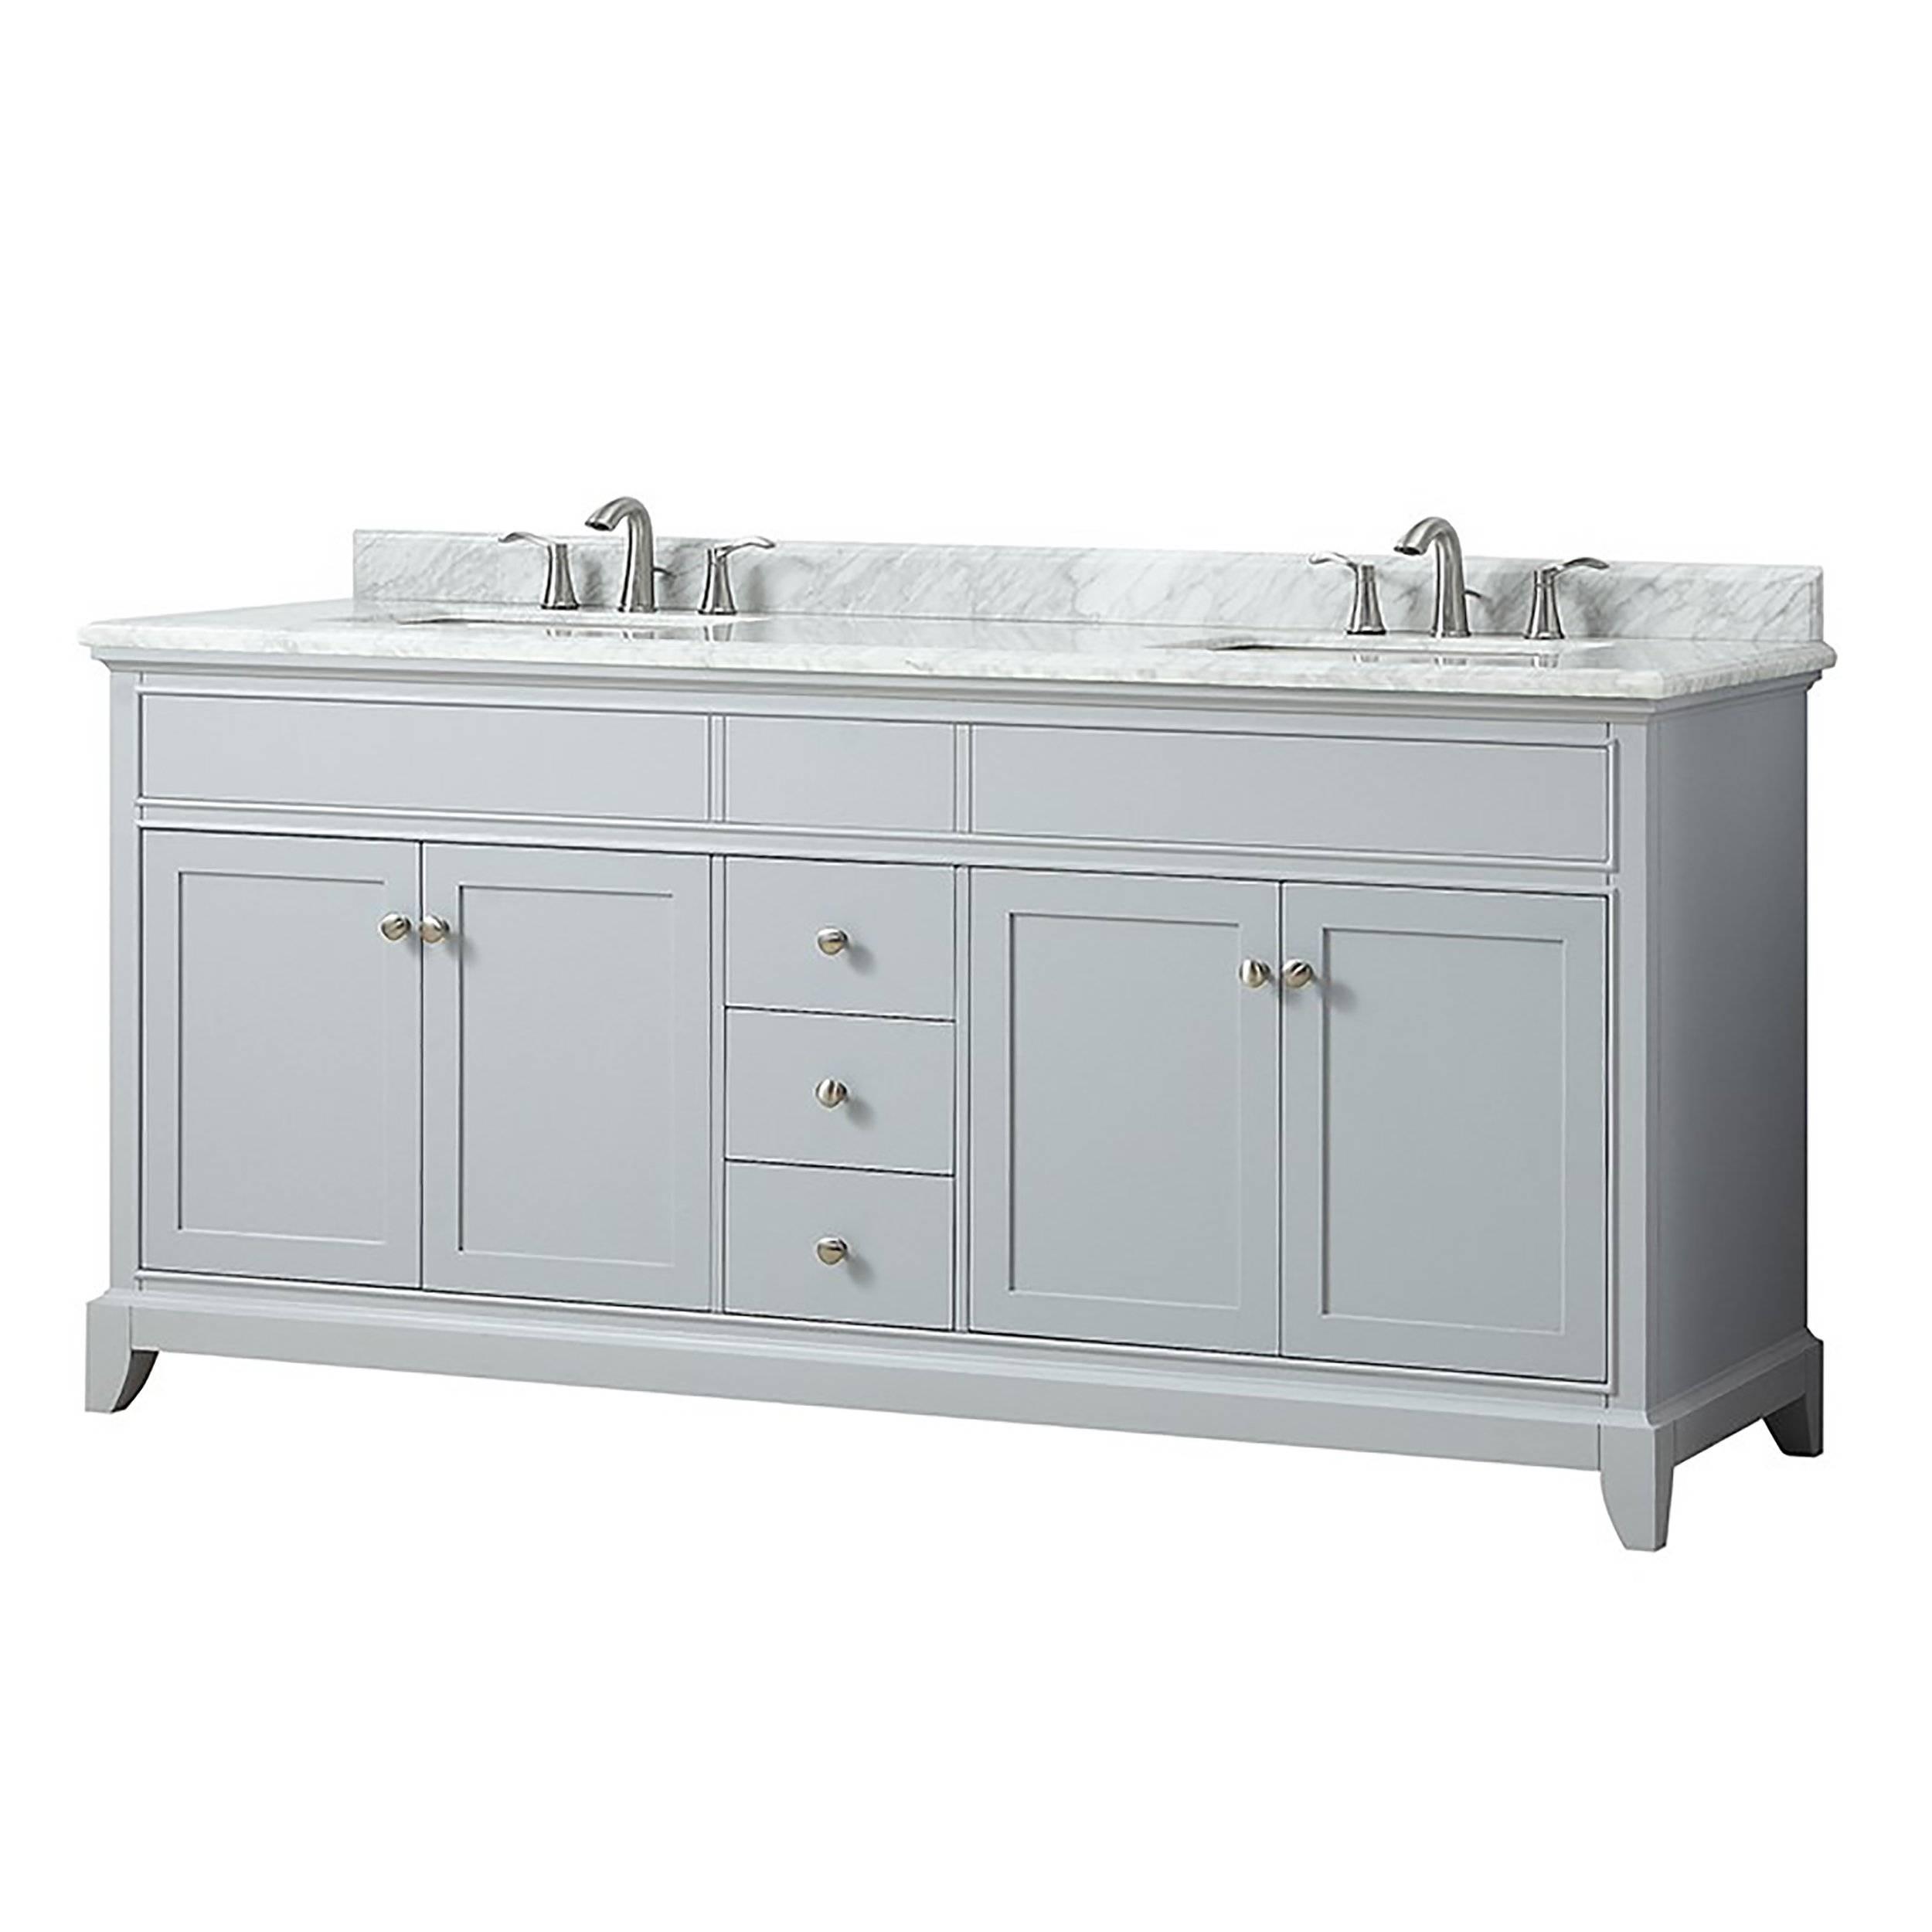 Aurora 73 In Vanity With Carrara Marble Top 73in 100610344 Floor And Decor